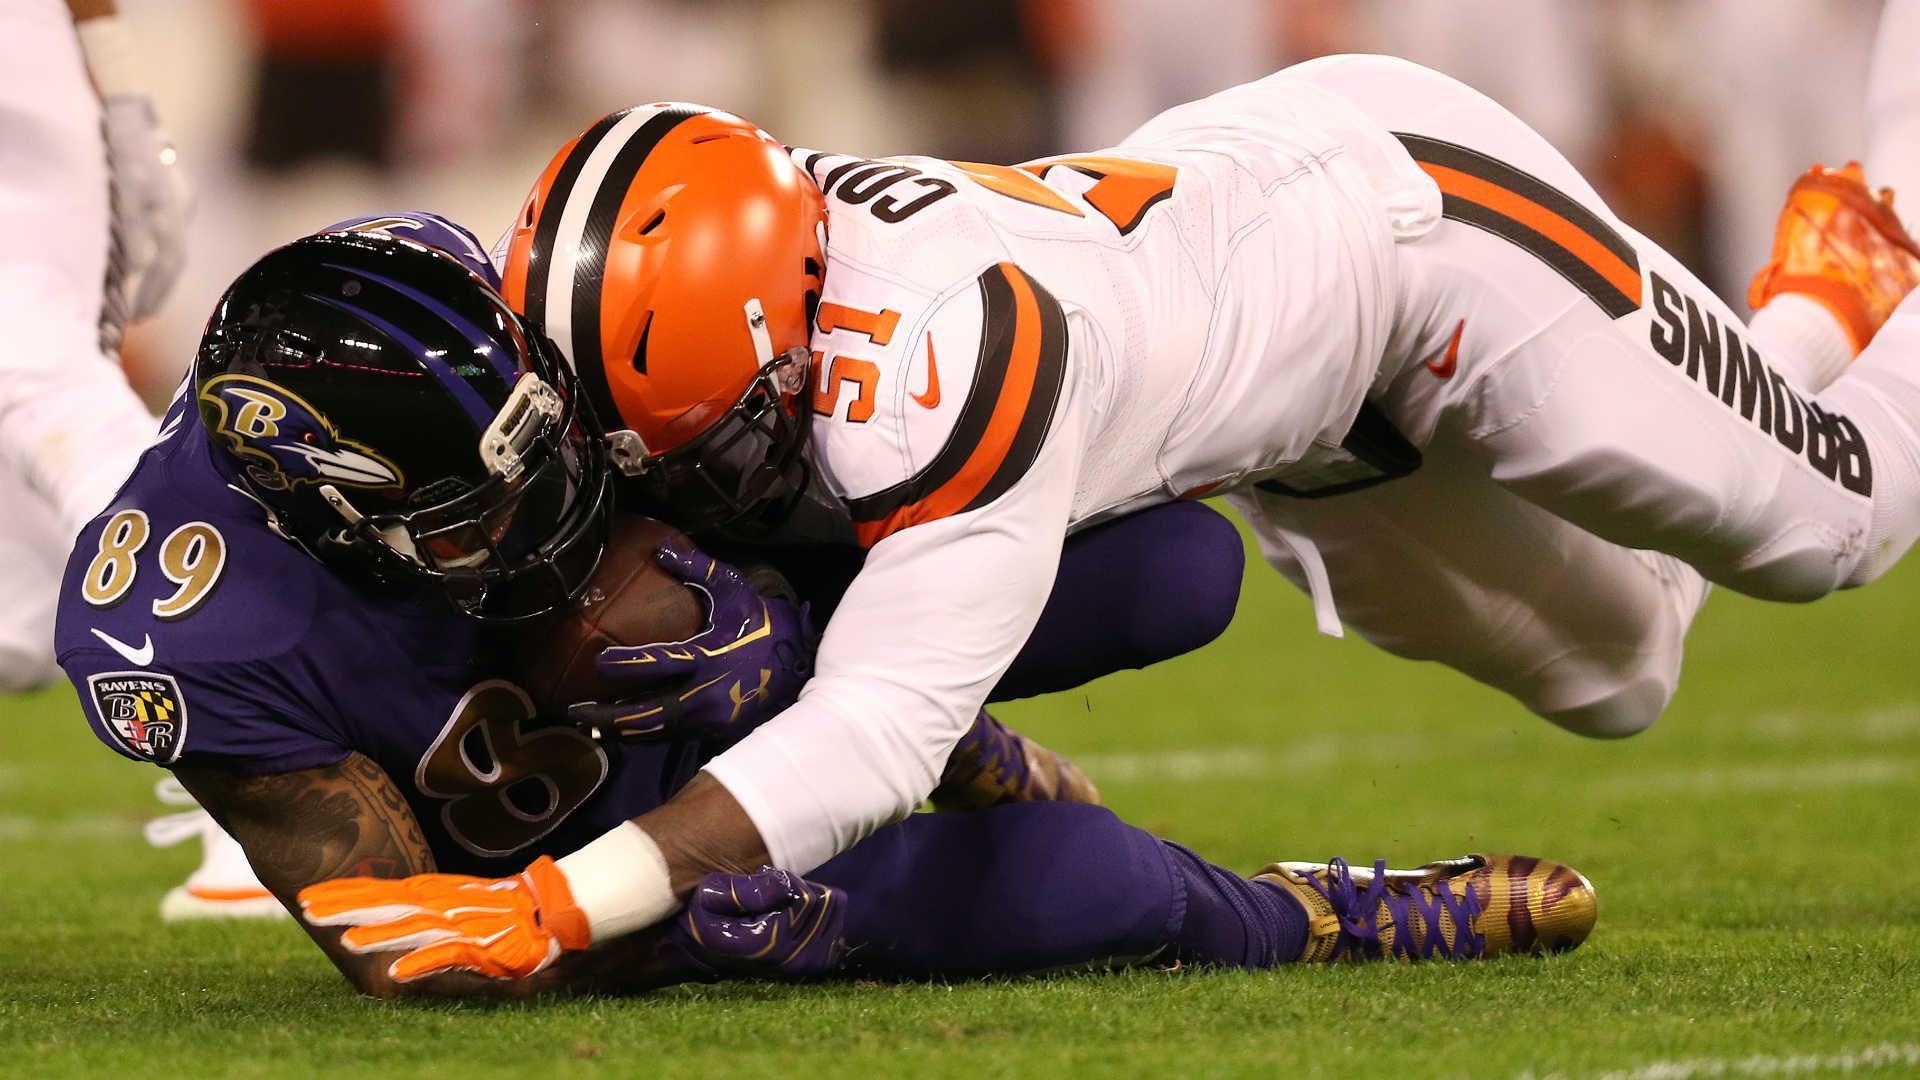 Browns-linebacker-jamie-collins_6ef14xedxtqq12avvn7a5j0wx